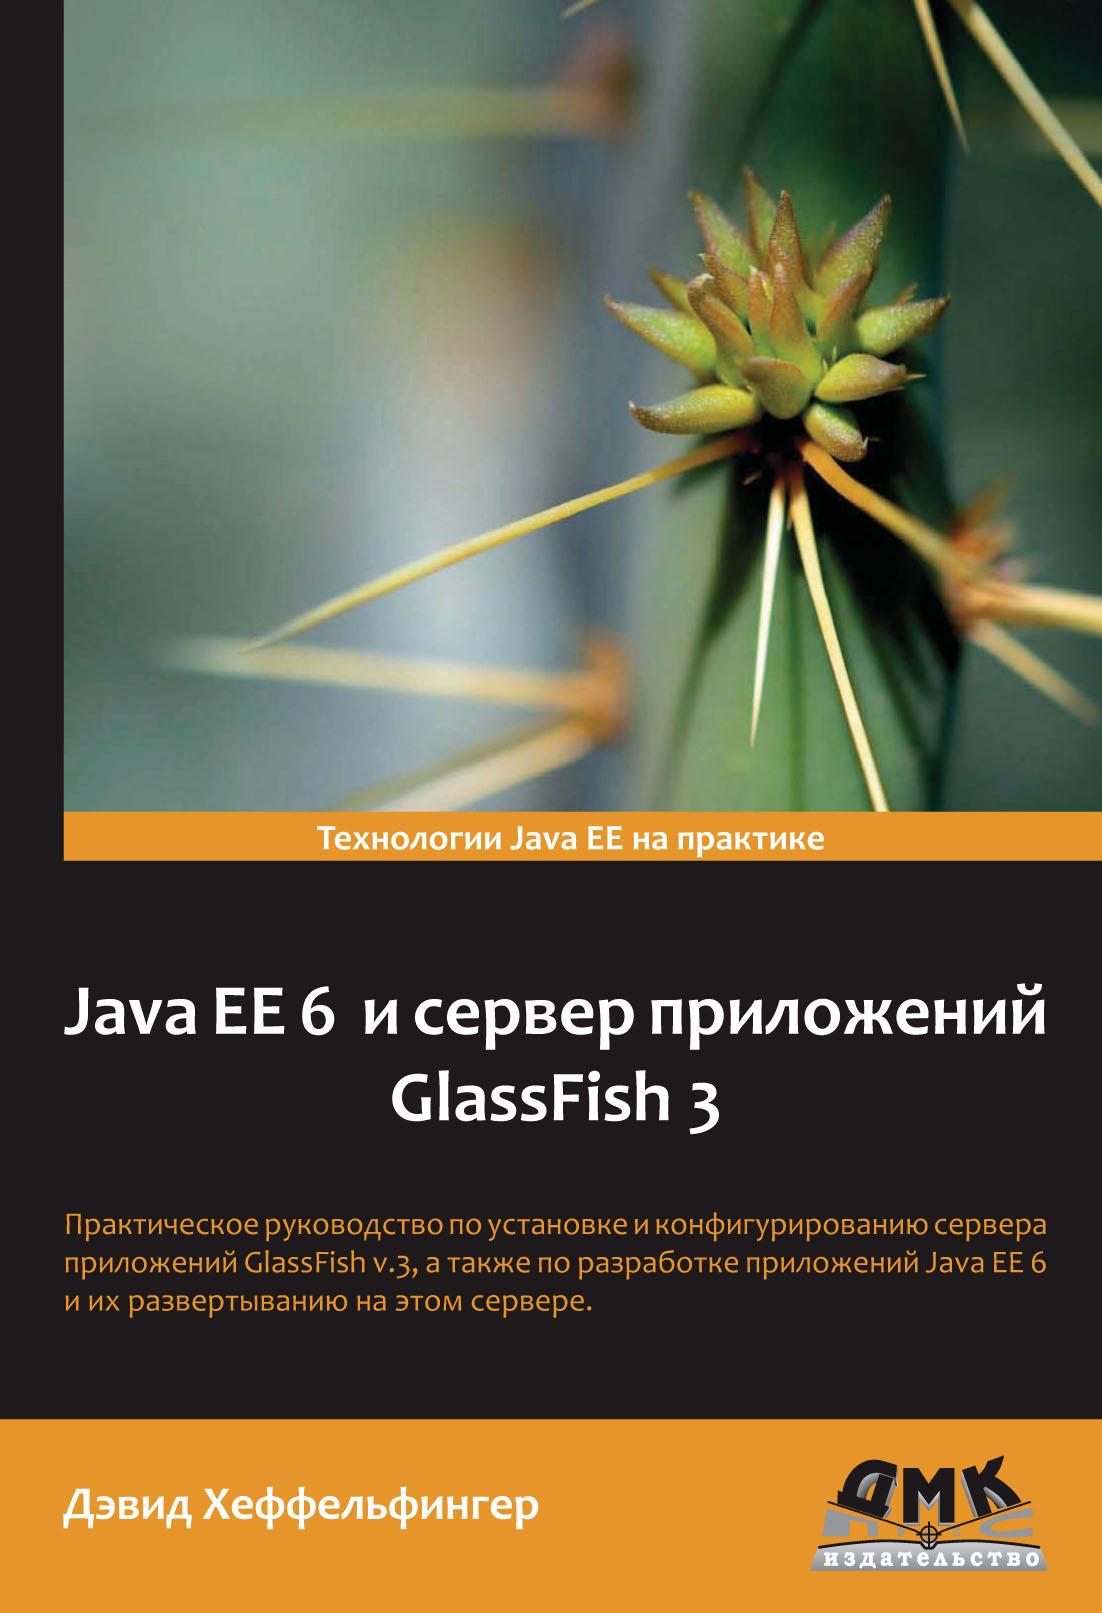 Дэвид Хеффельфингер Java EE 6 и сервер приложений GlassFish 3 бретт мак лахлин java и xml 2 е издание